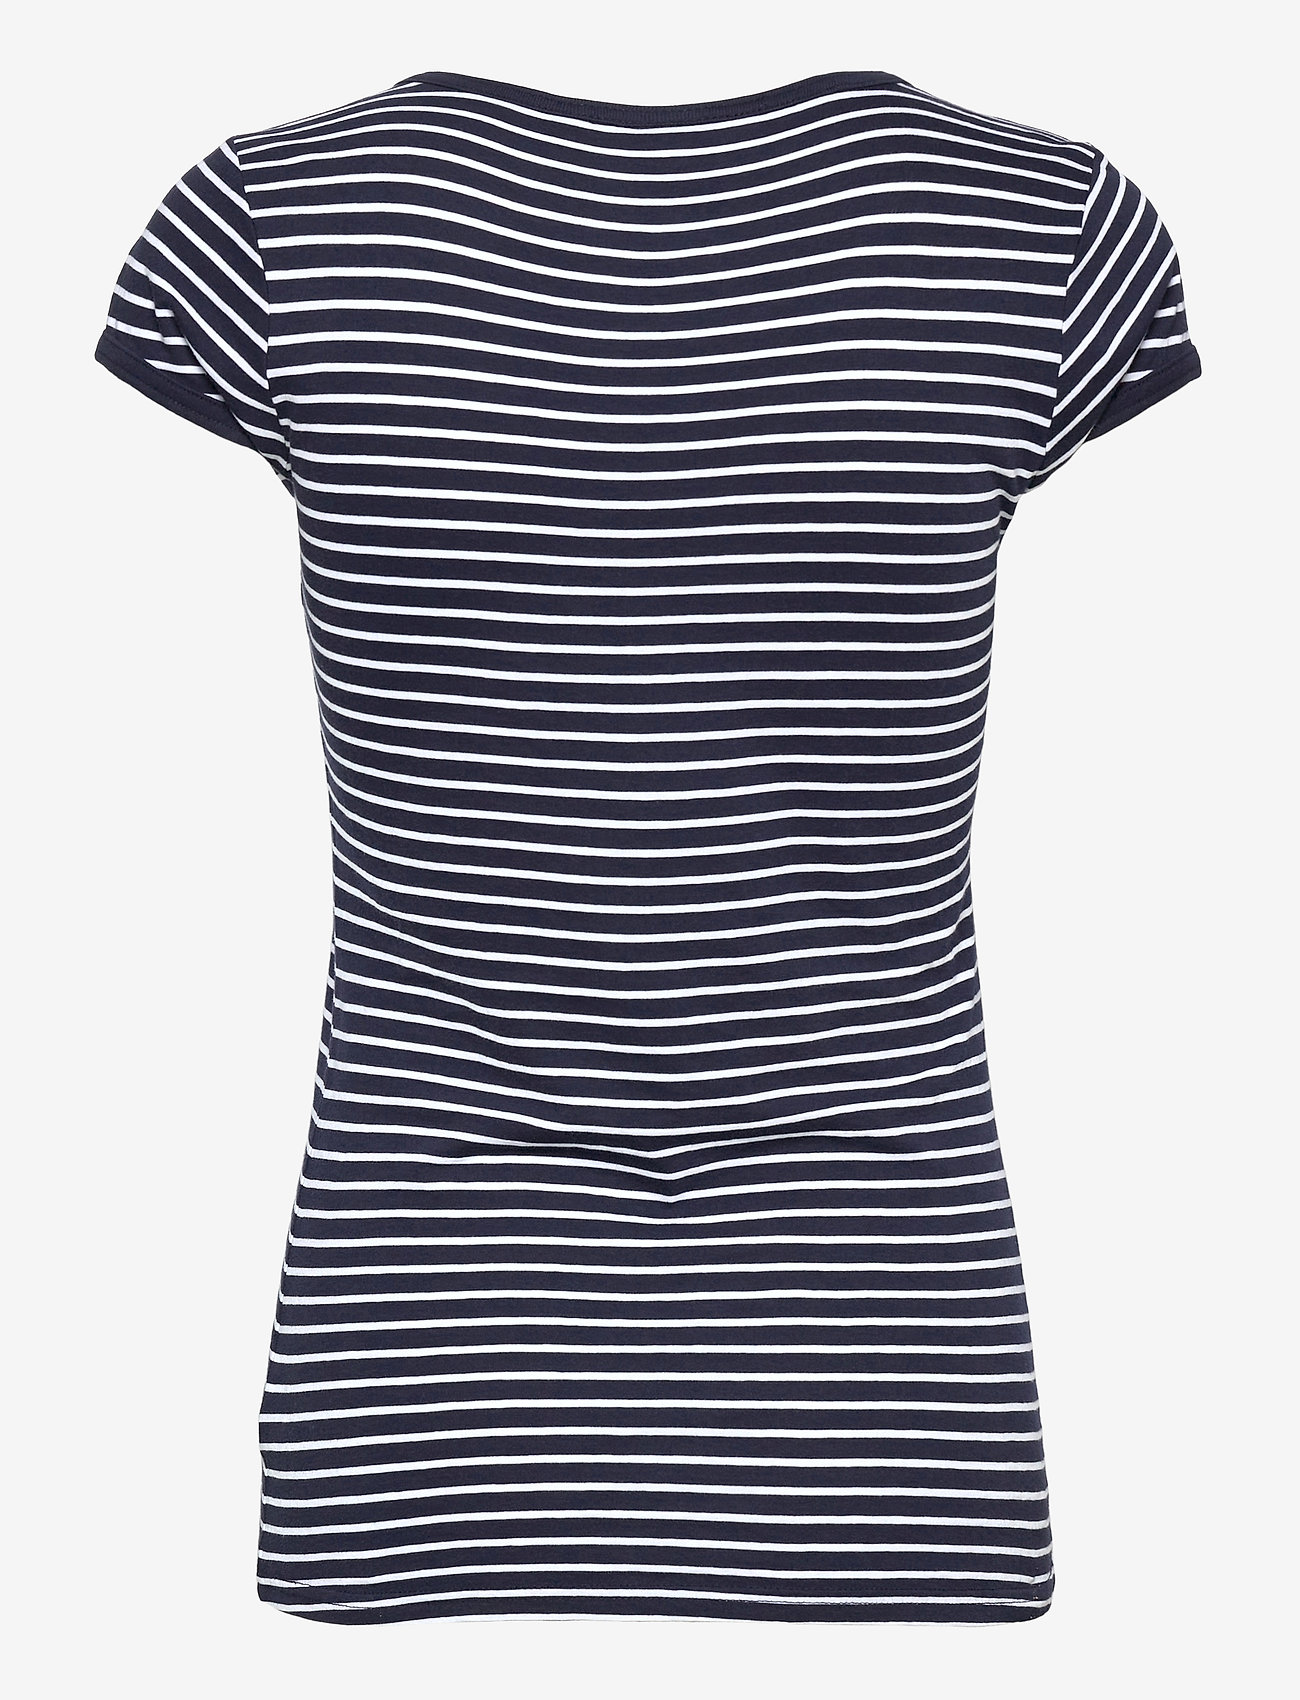 G-star RAW - Core eyben slim u t wmn s\s - t-shirts - sartho blue elise stripe - 1